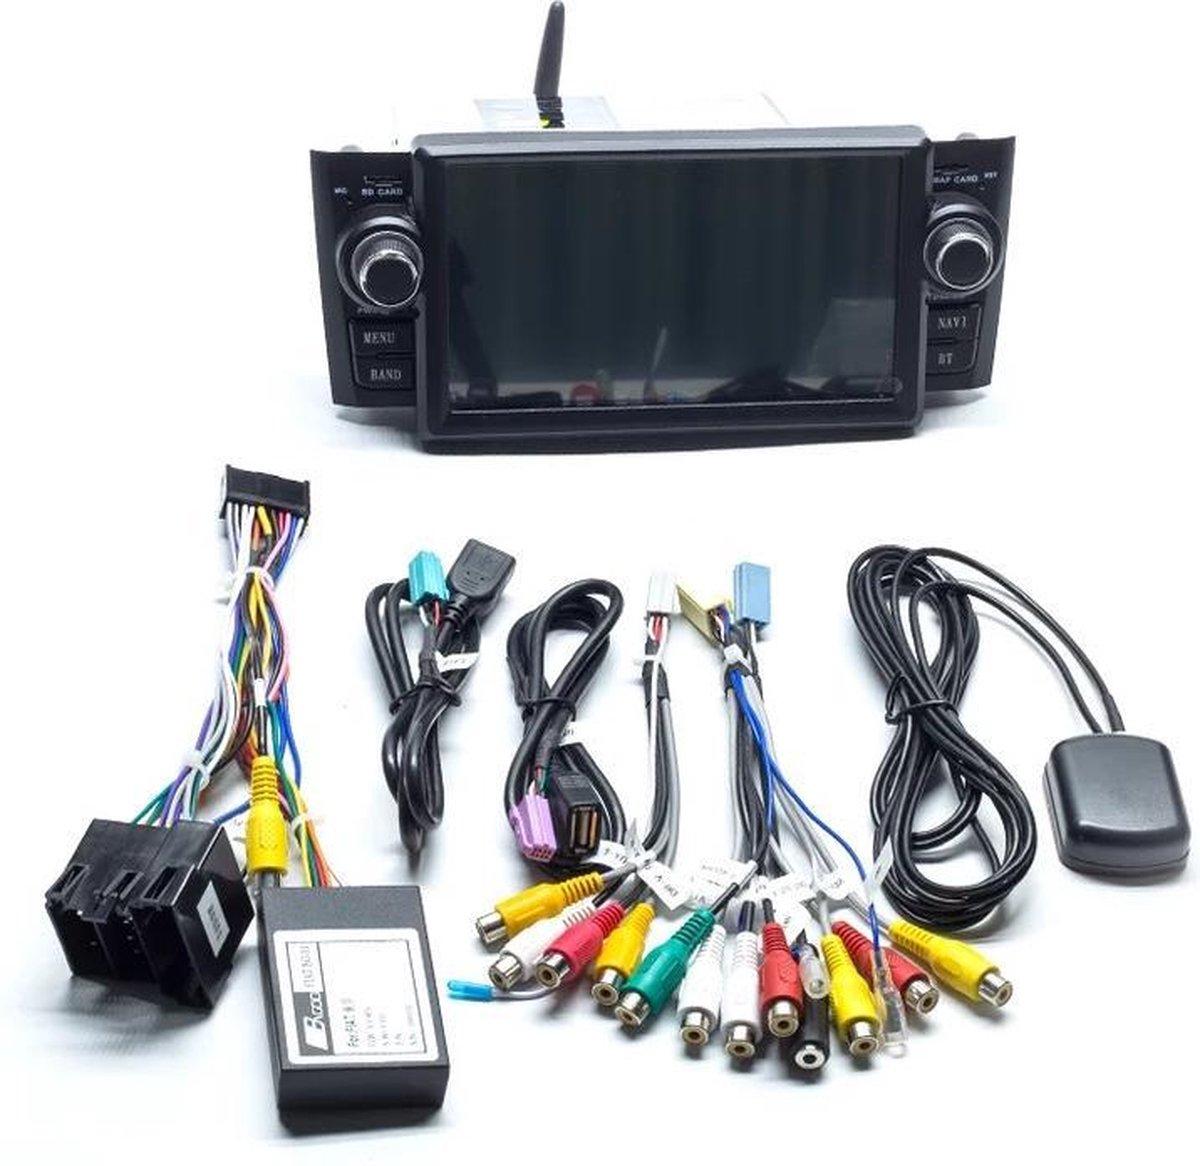 Fiat Grande Punto Linea met ingebwoude CarPlay 2007-2012 Android 10 navigatie en multimediasysteem bluetooth usb wifi